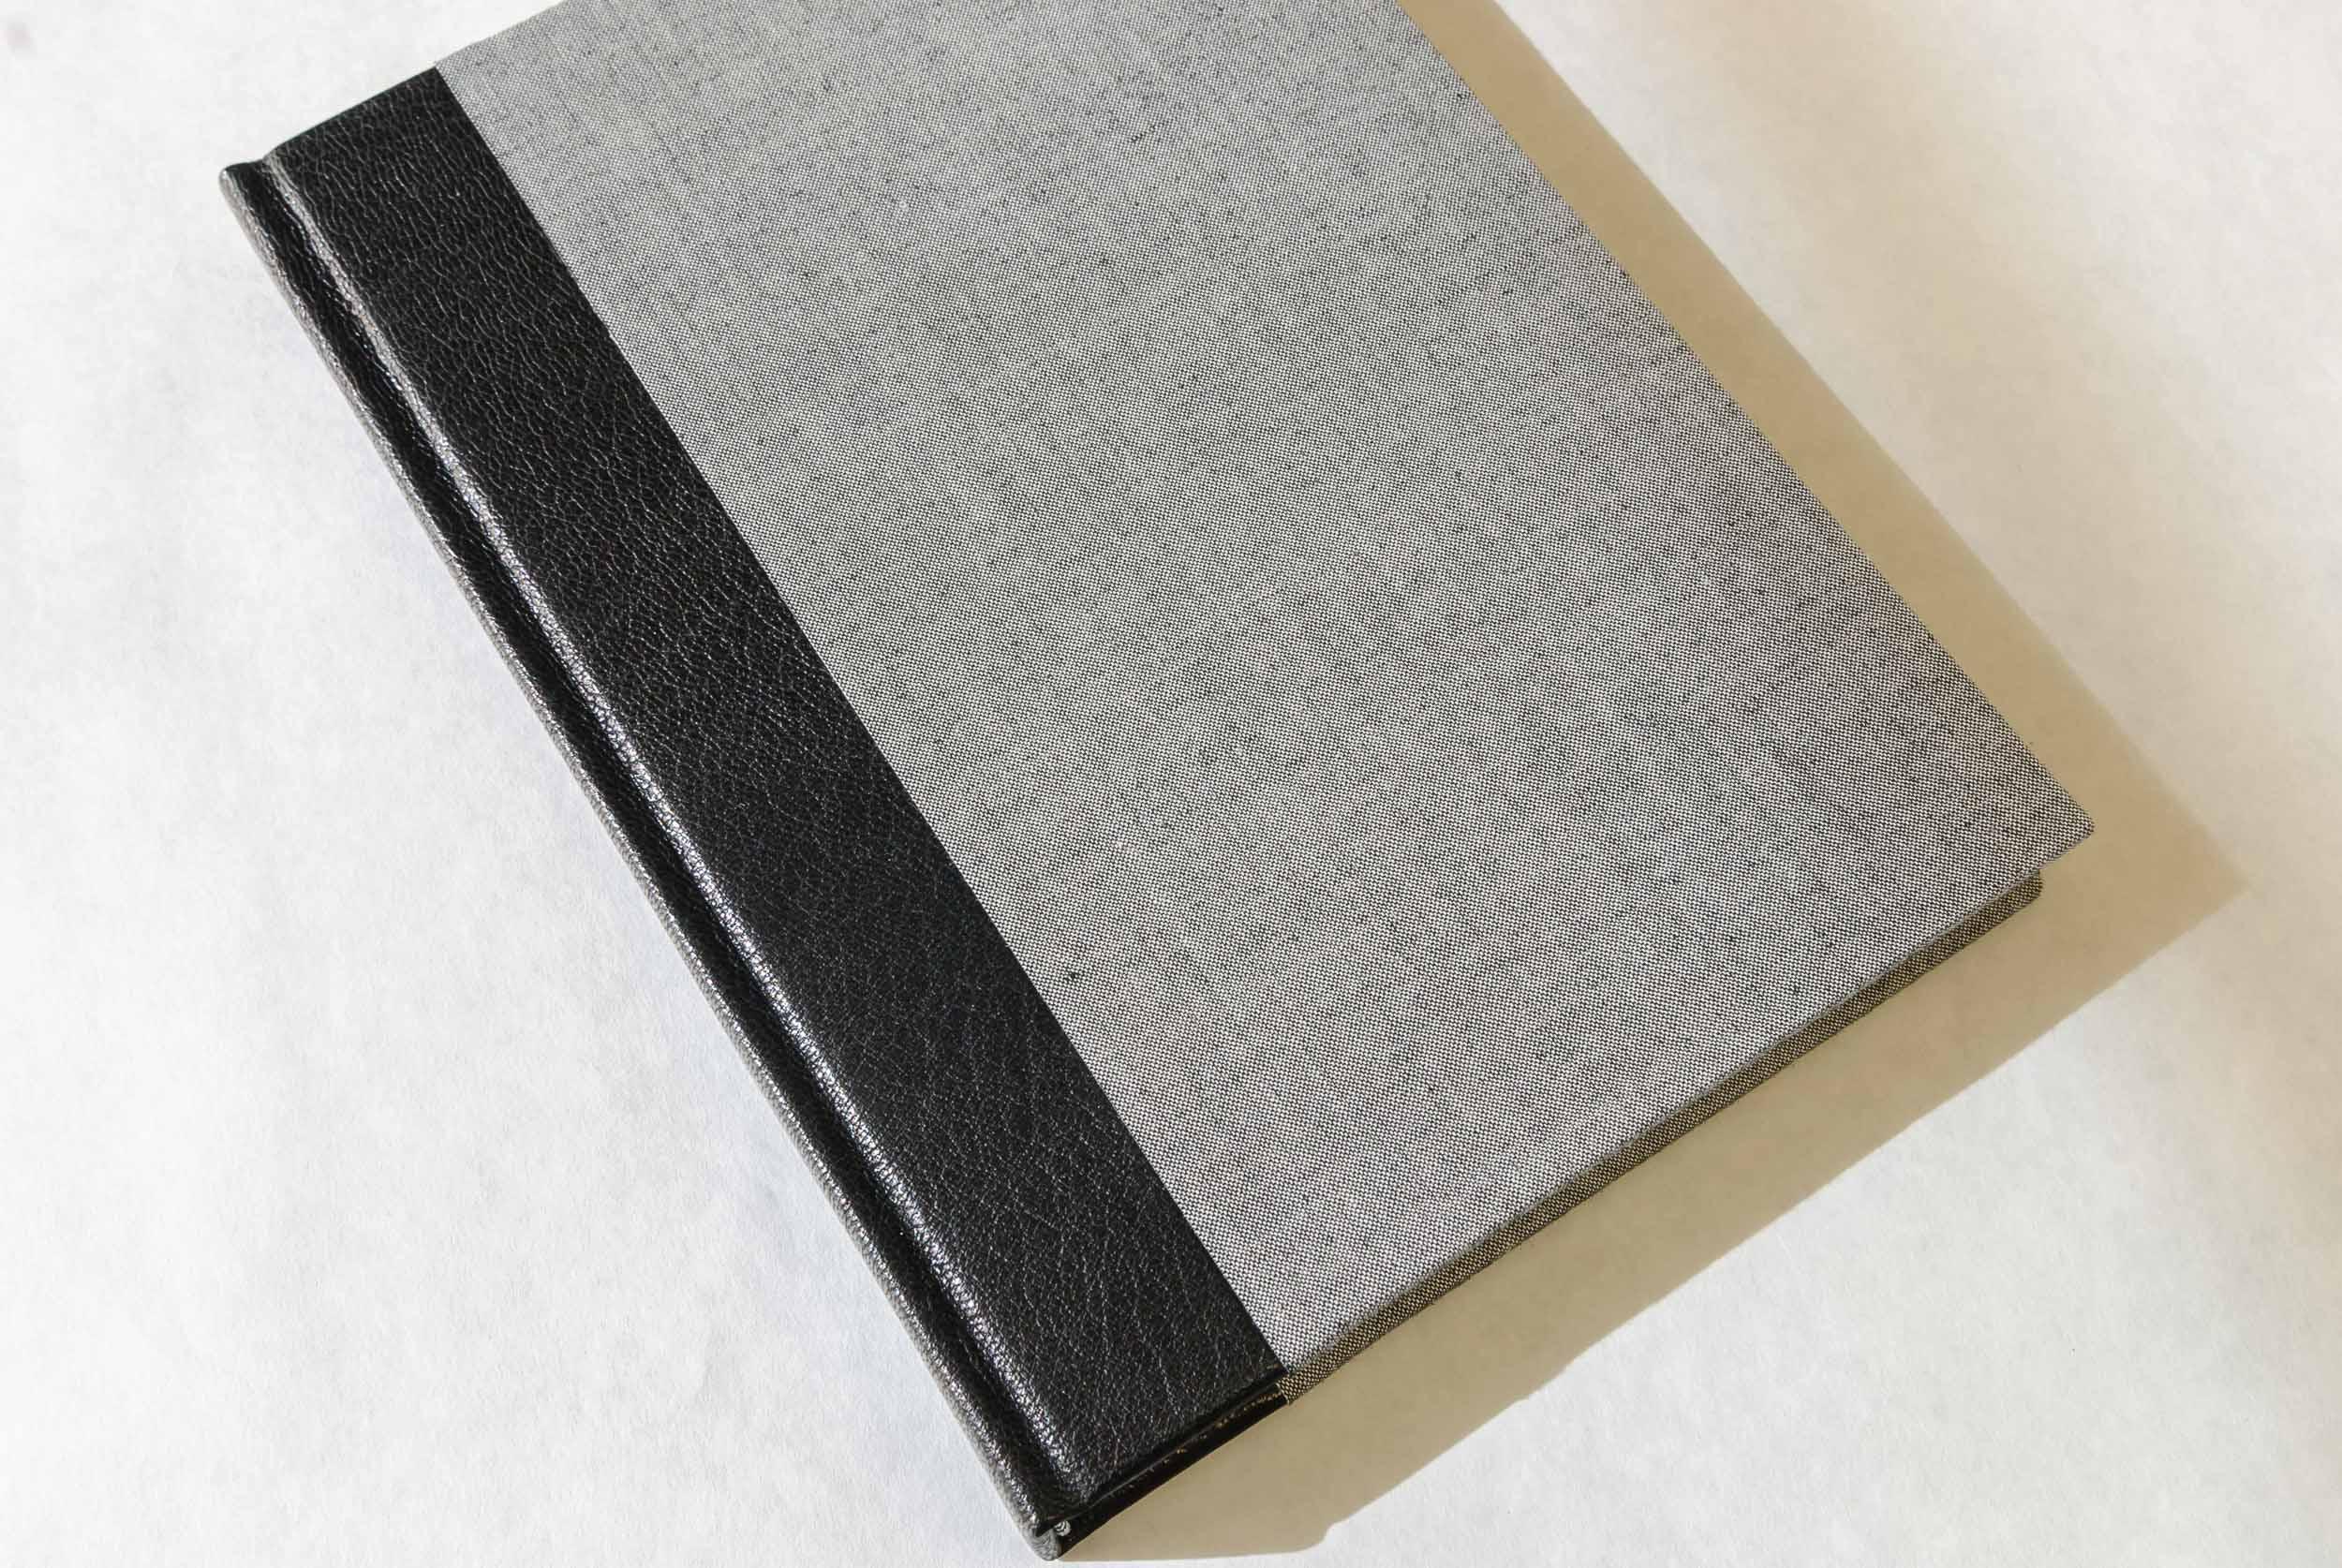 Classic format, design 2 (Japanese woodblock), no label